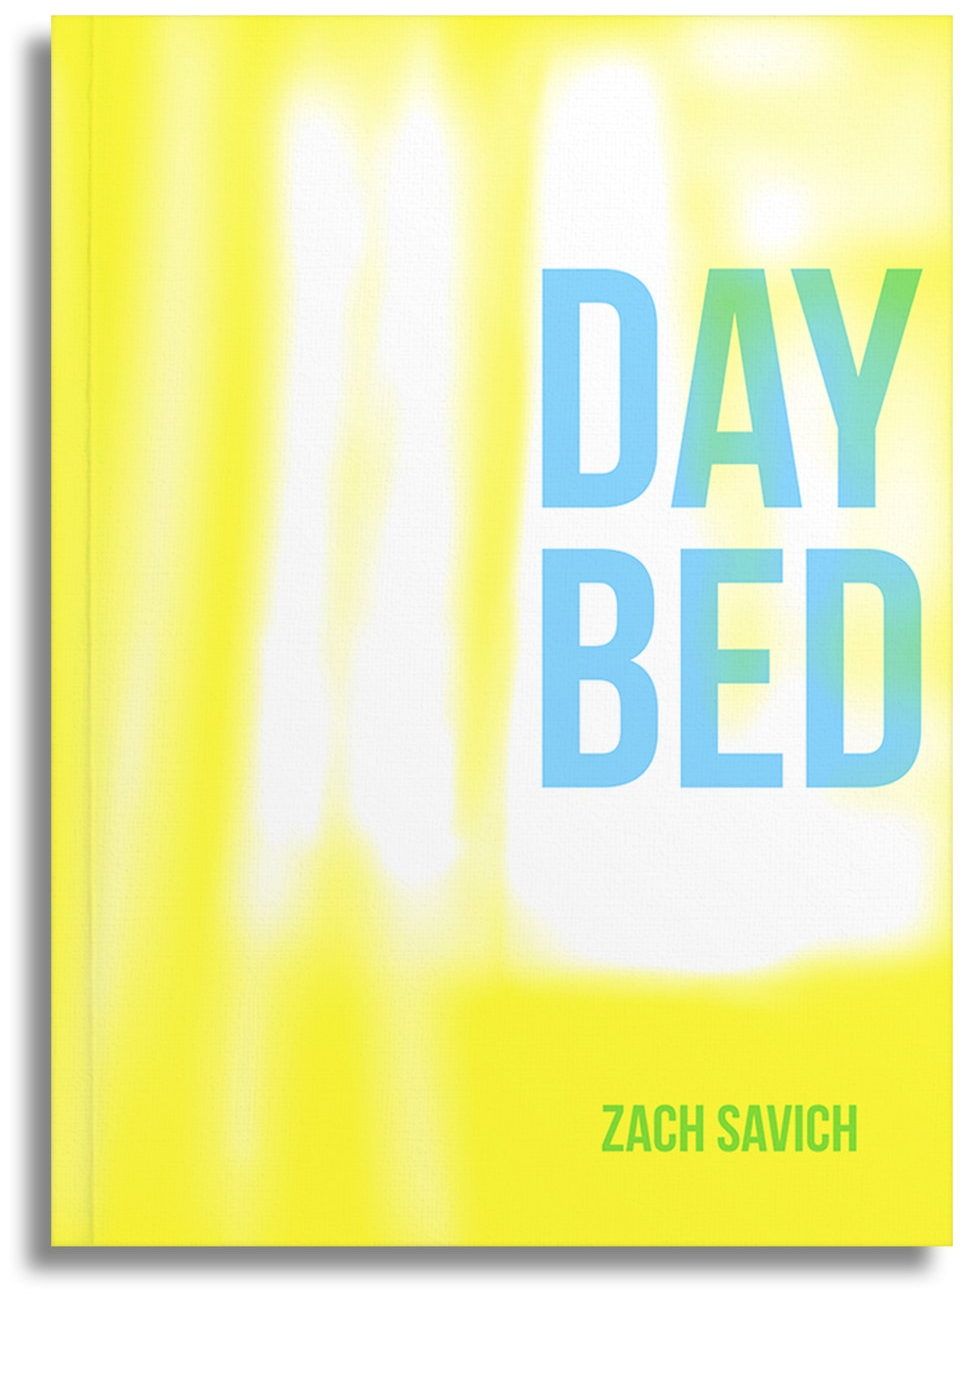 Daybed by Zach Savich